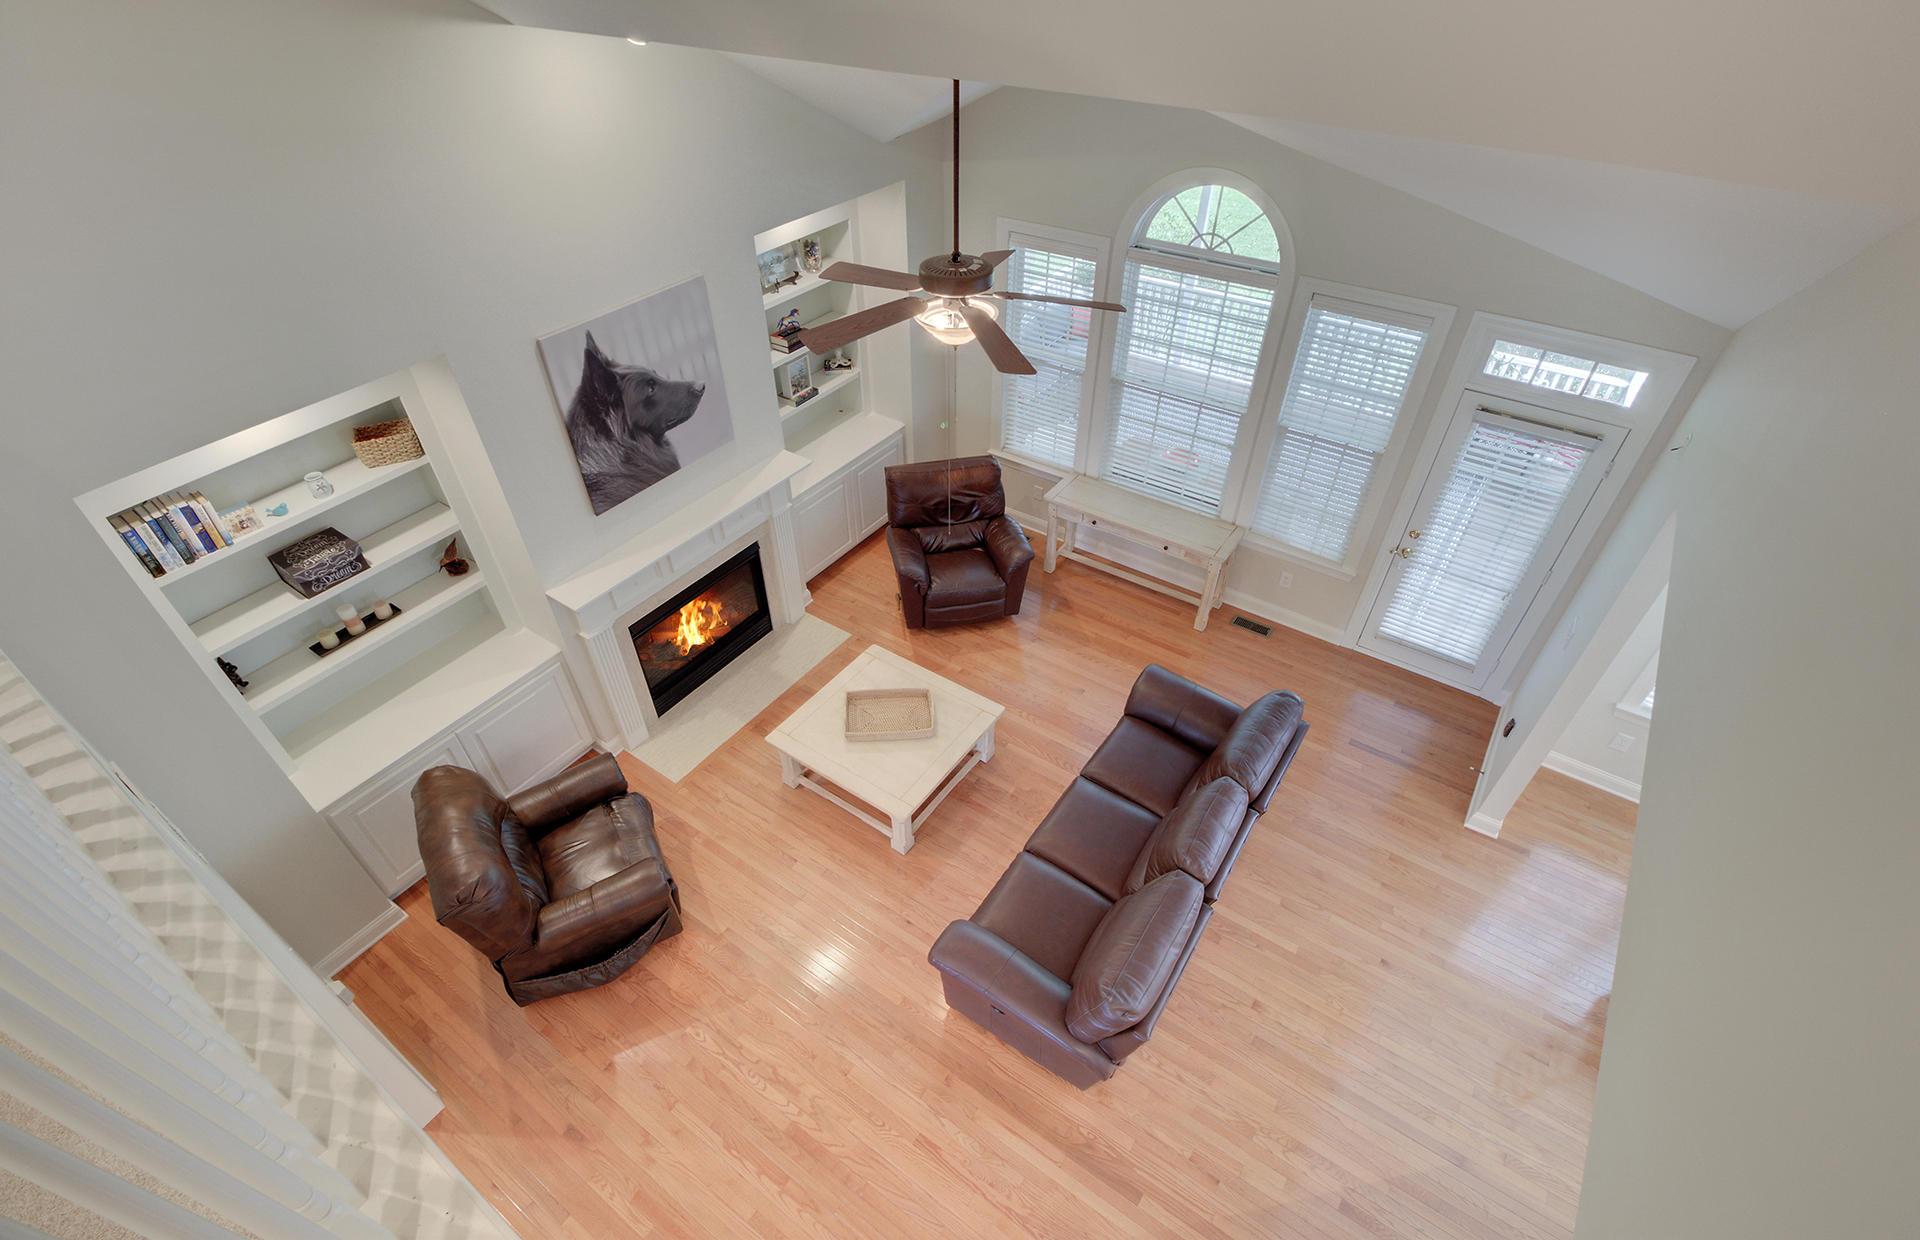 Dunes West Homes For Sale - 2453 Darts Cove, Mount Pleasant, SC - 28